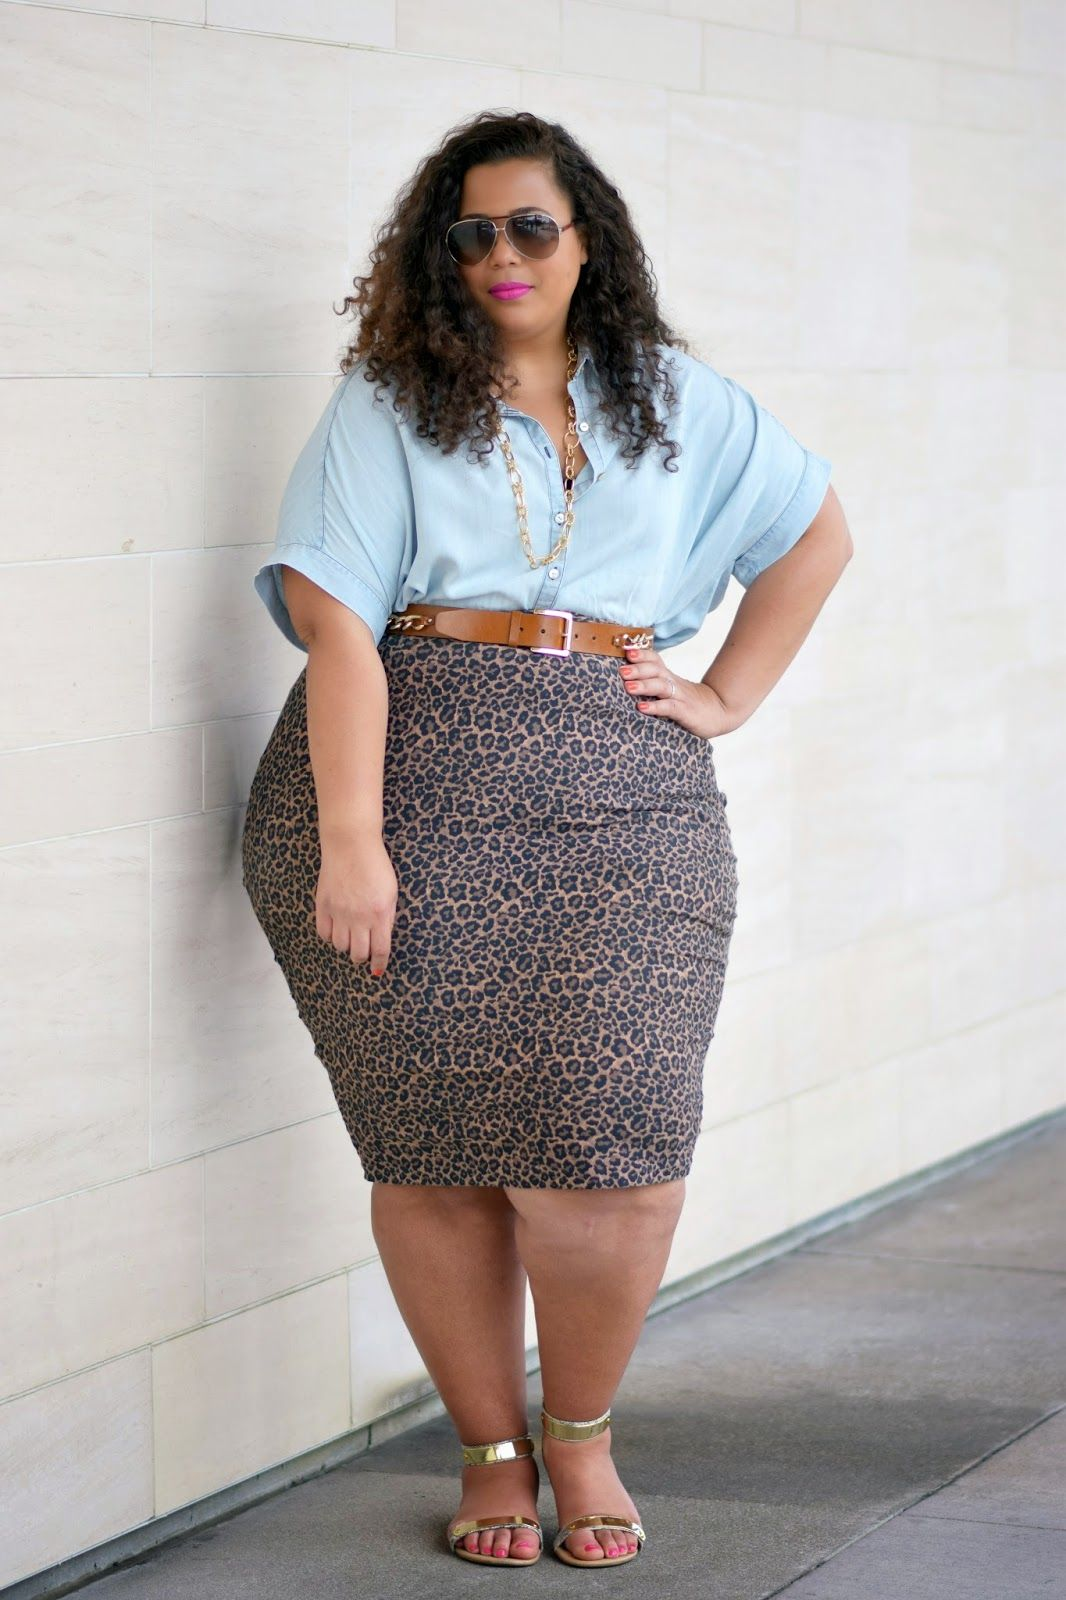 Plus size chambray shirt outfit plus size fashion for Plus size chambray shirt